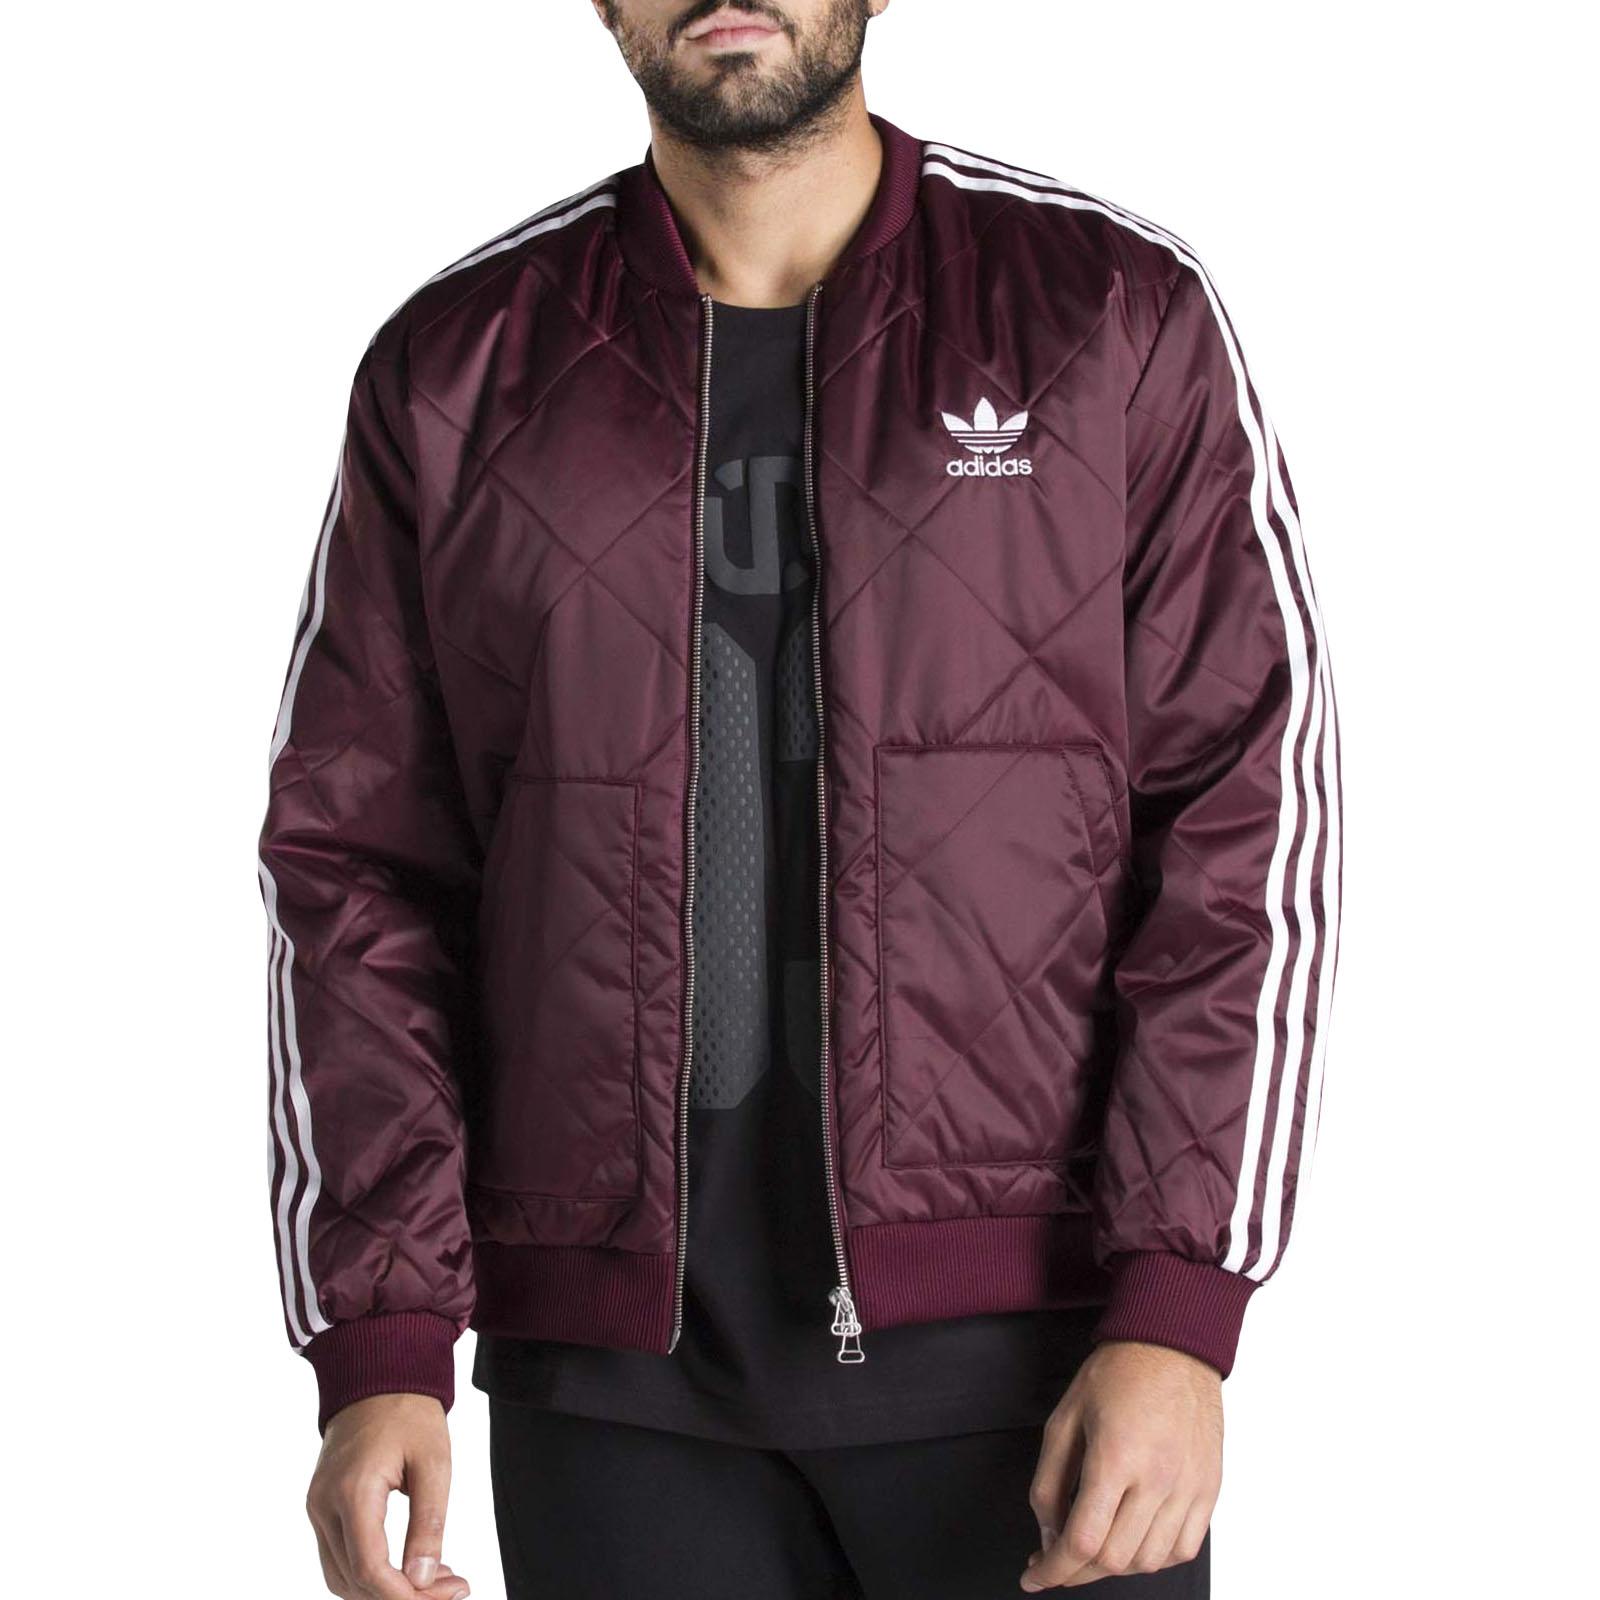 159bd93f adidas Originals Mens Superstar Quilted Zipped Long Sleeve Bomber Jacket  -Maroon